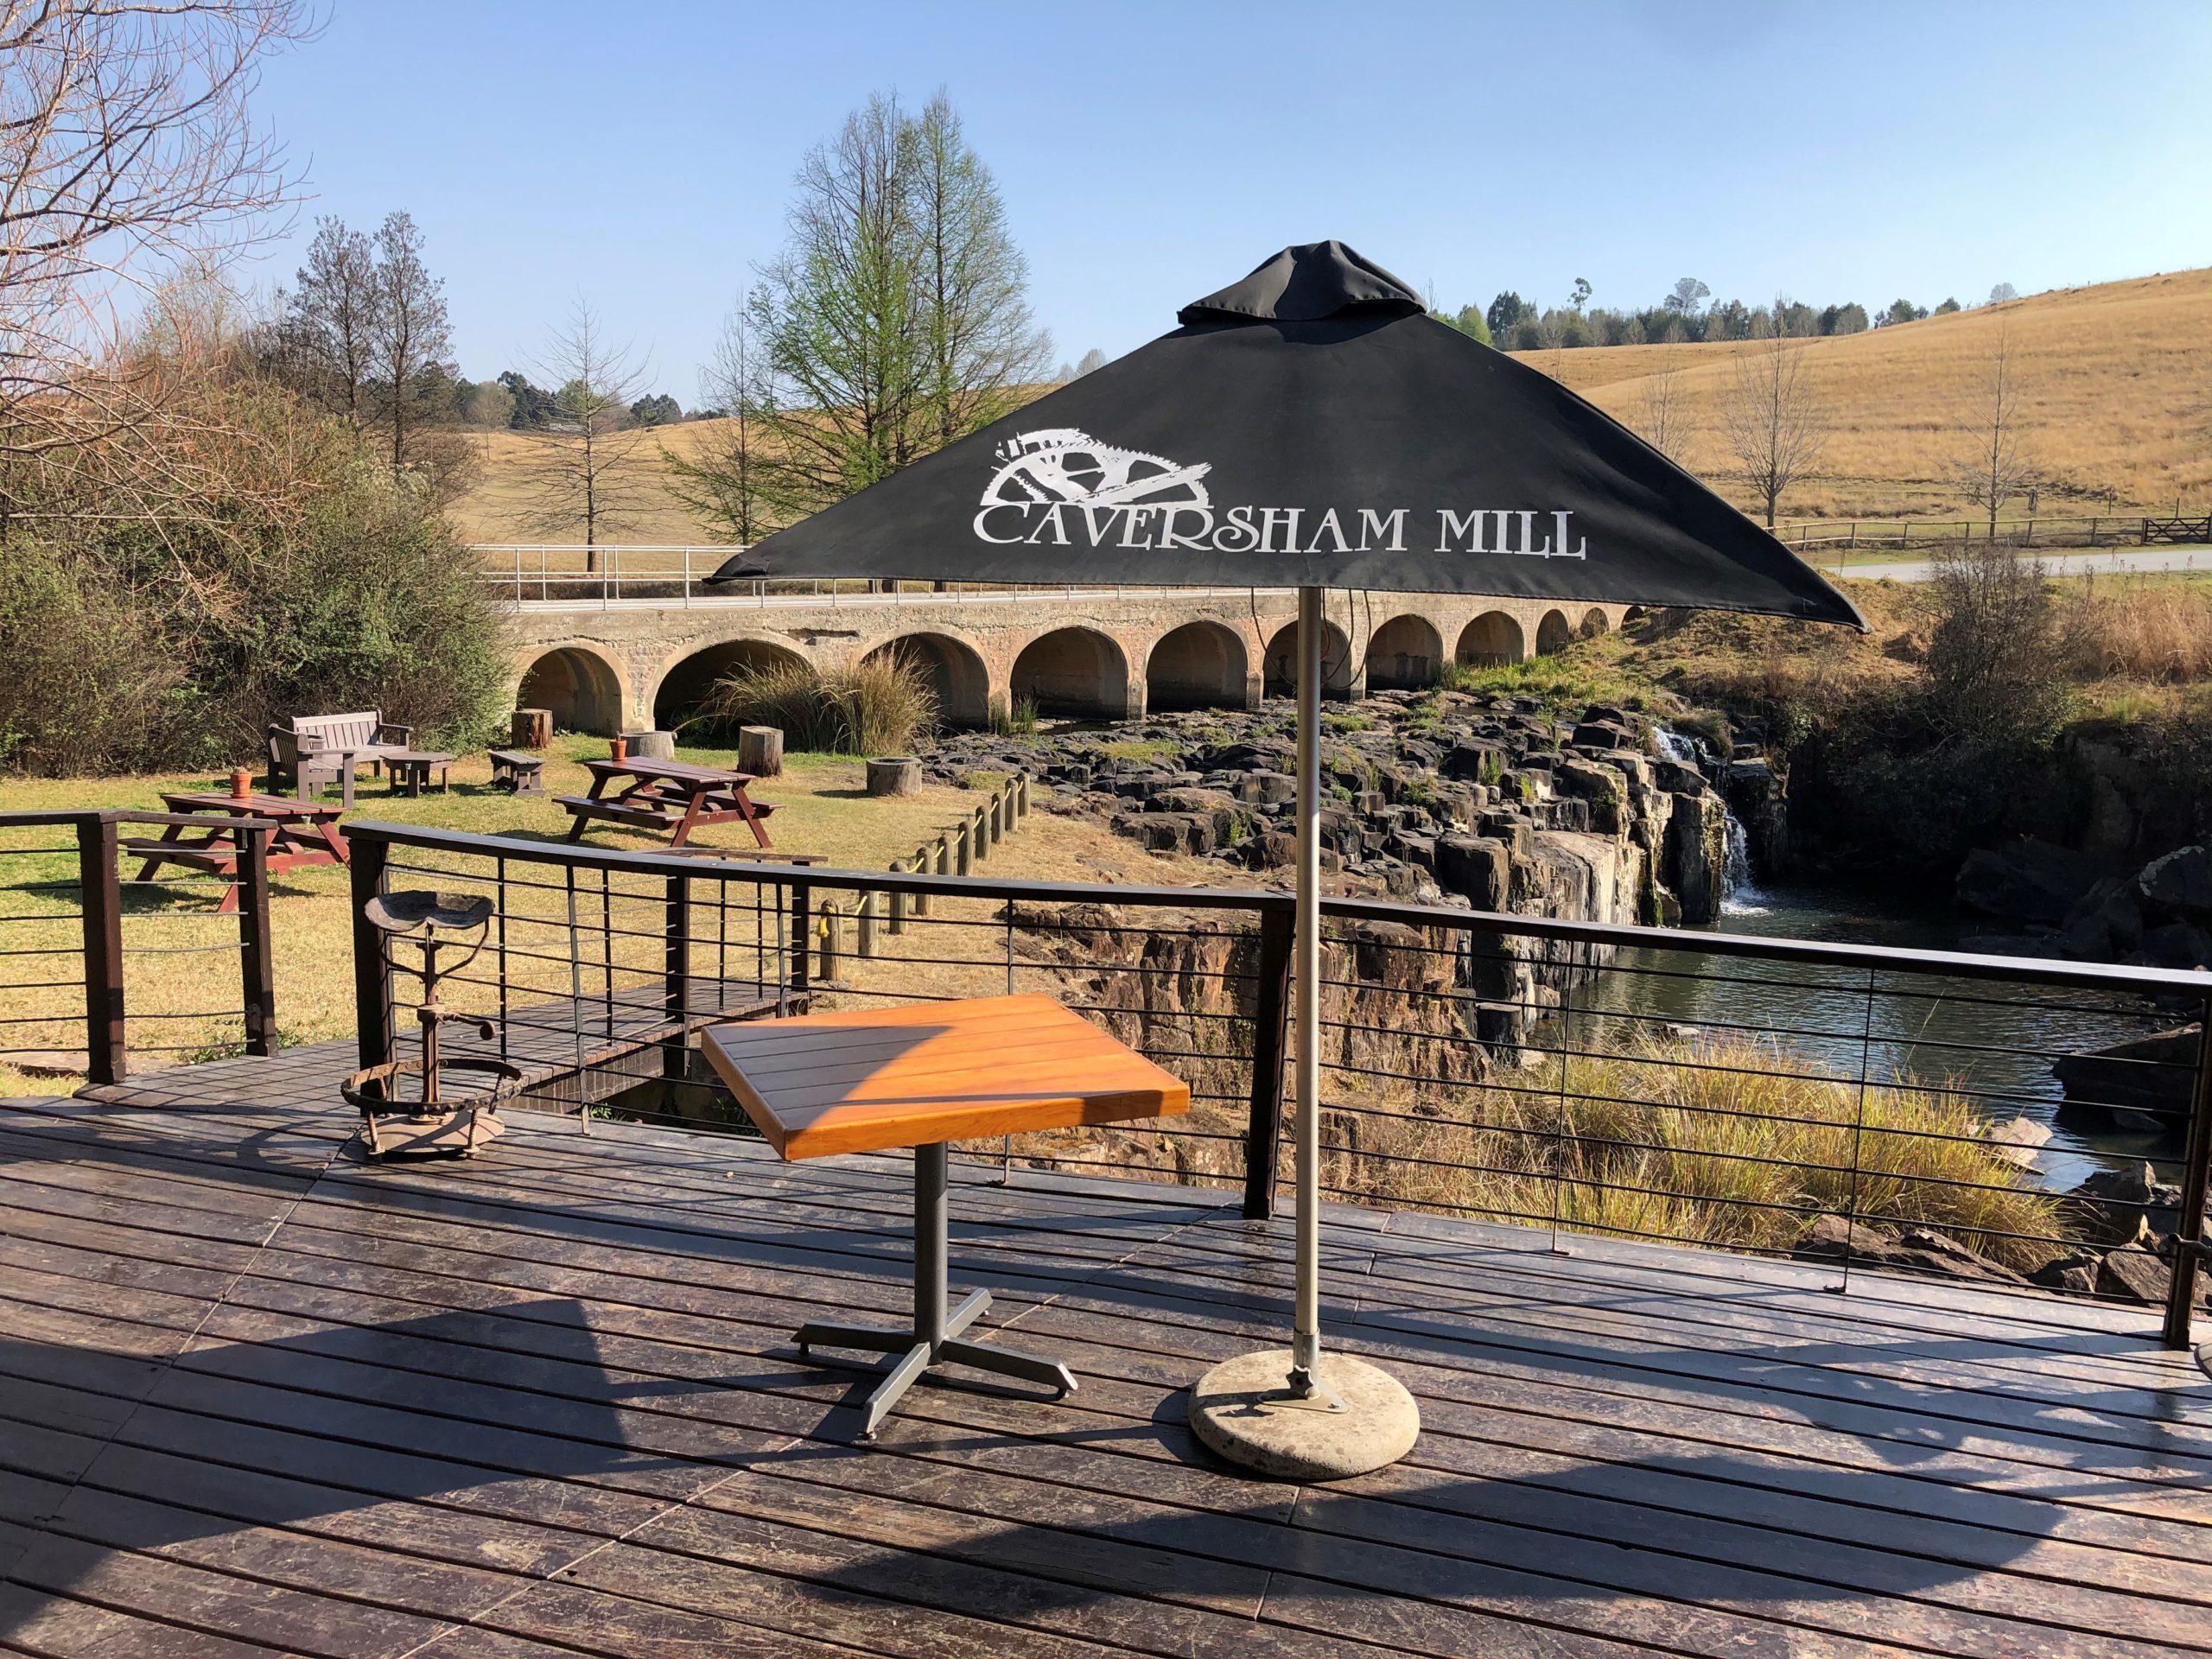 Caversham Mill Restaurant